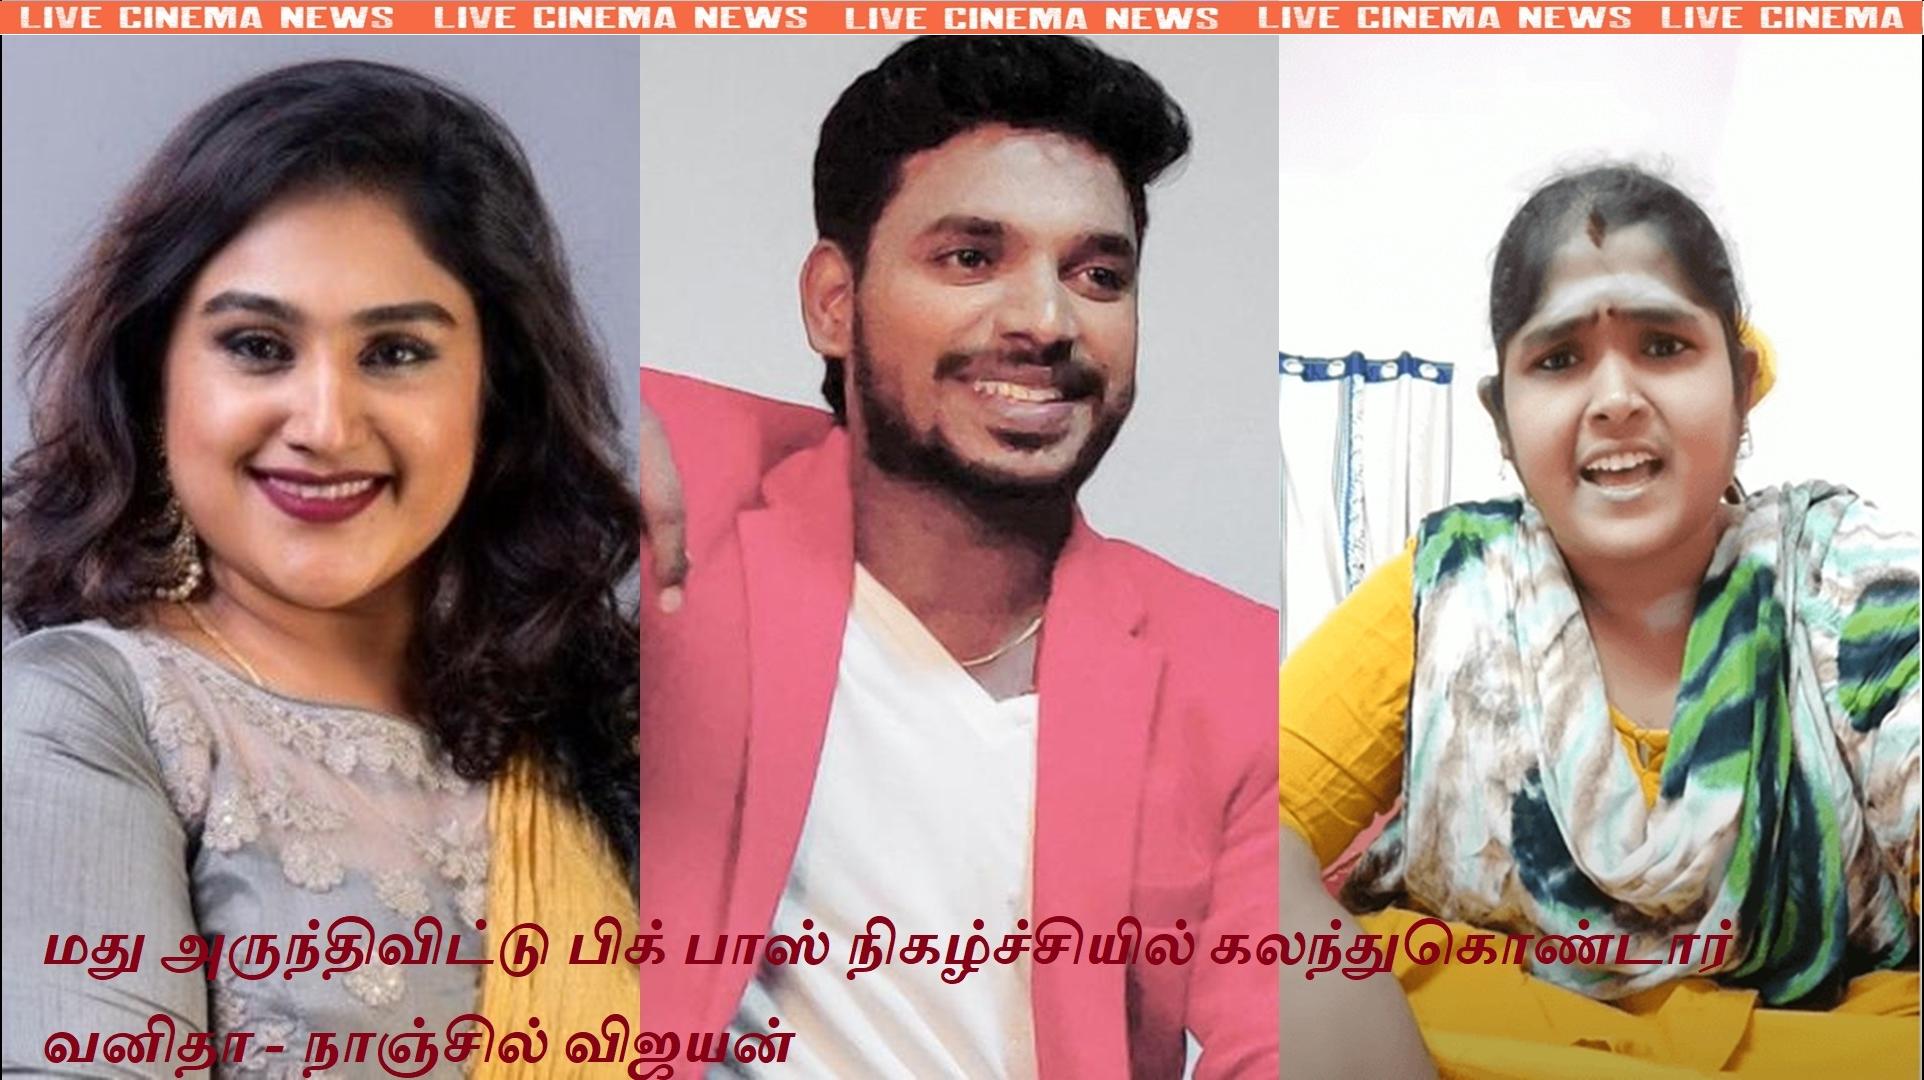 vanitha-vijayakumar-drunk-before-entering-big-boss-3-final-nanjil-vijayan